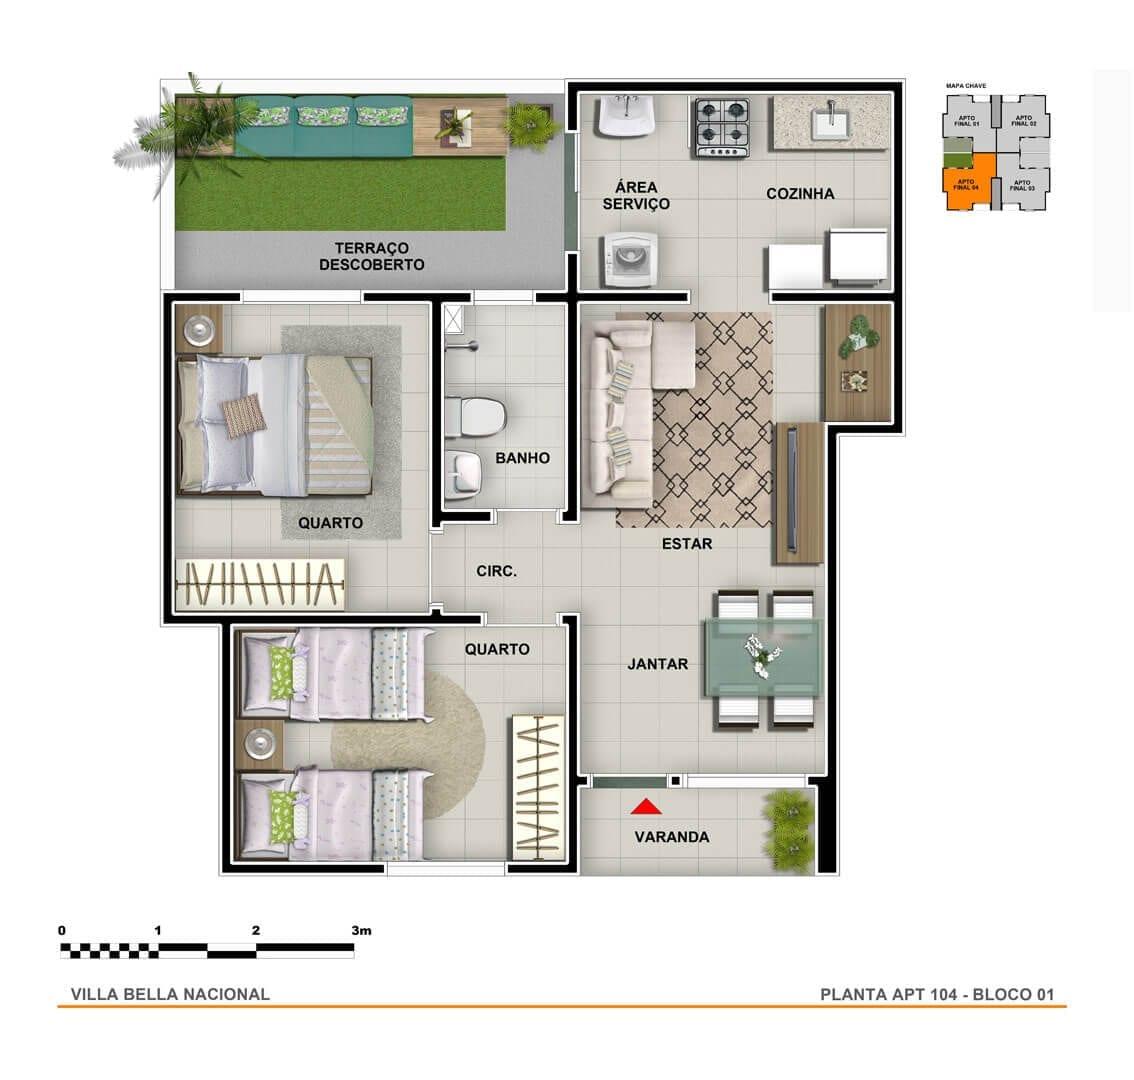 vic-engenharia-villa-bella-nacional-apartamento-area-privativa